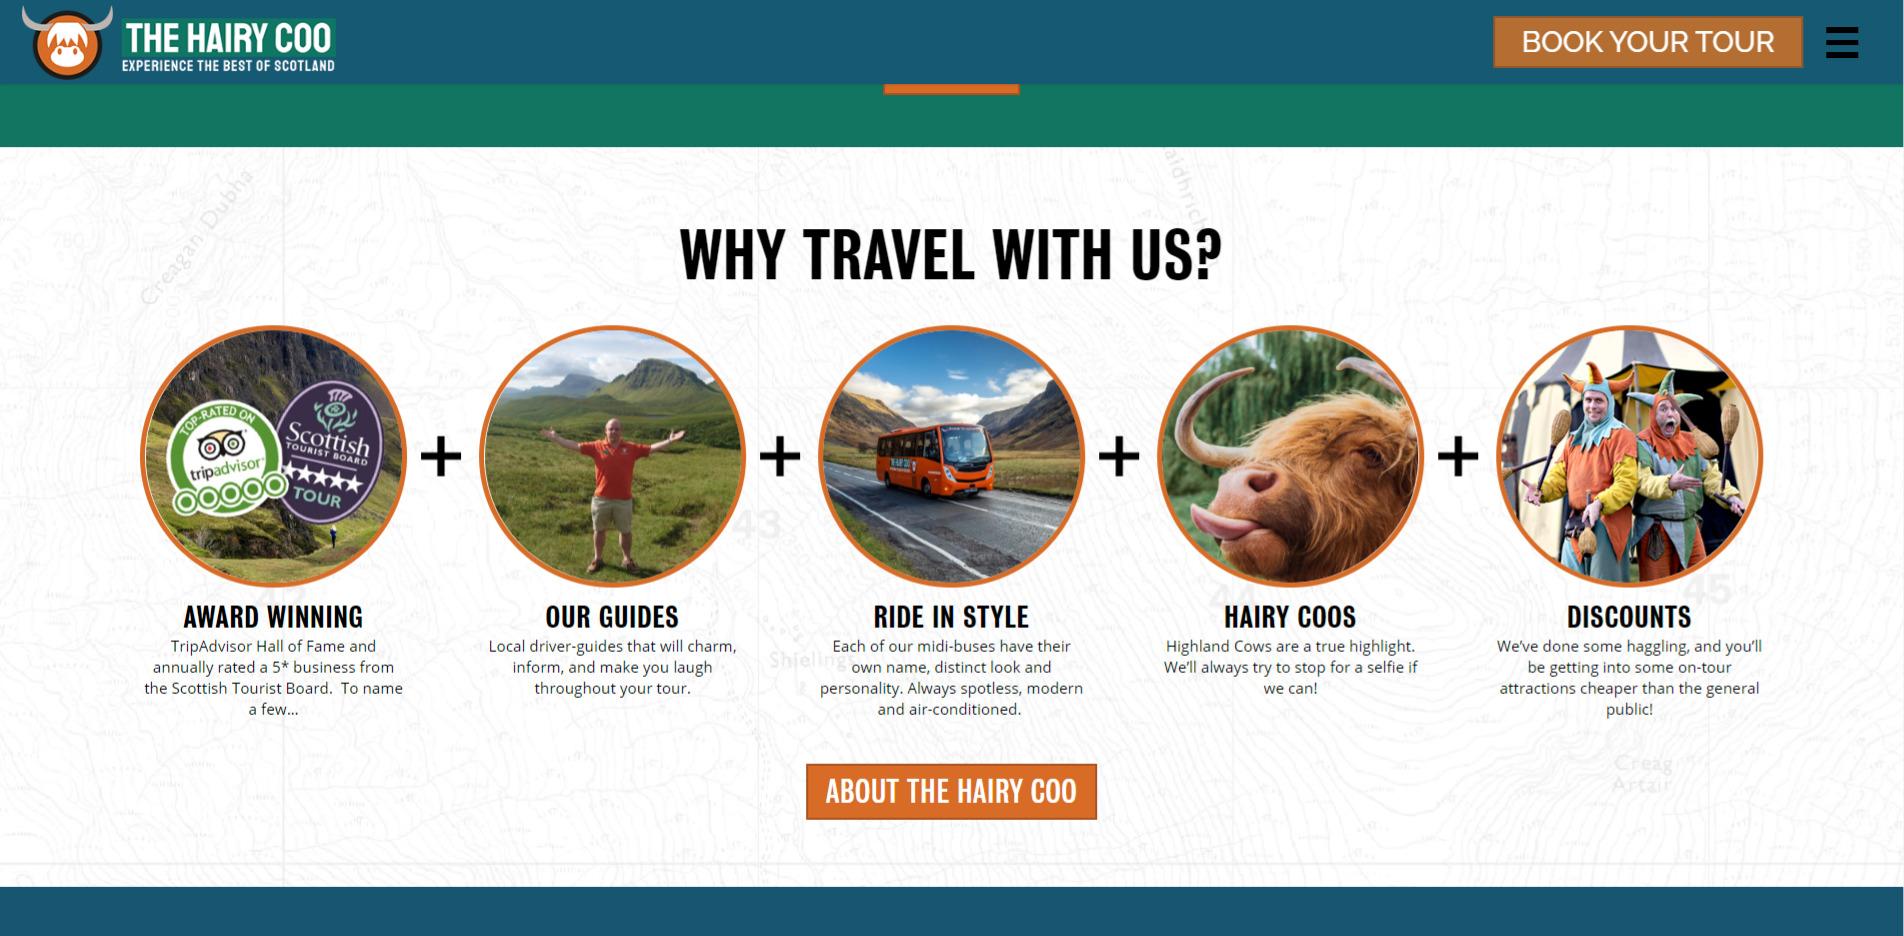 Hairy Coo Website Design 2020 Information